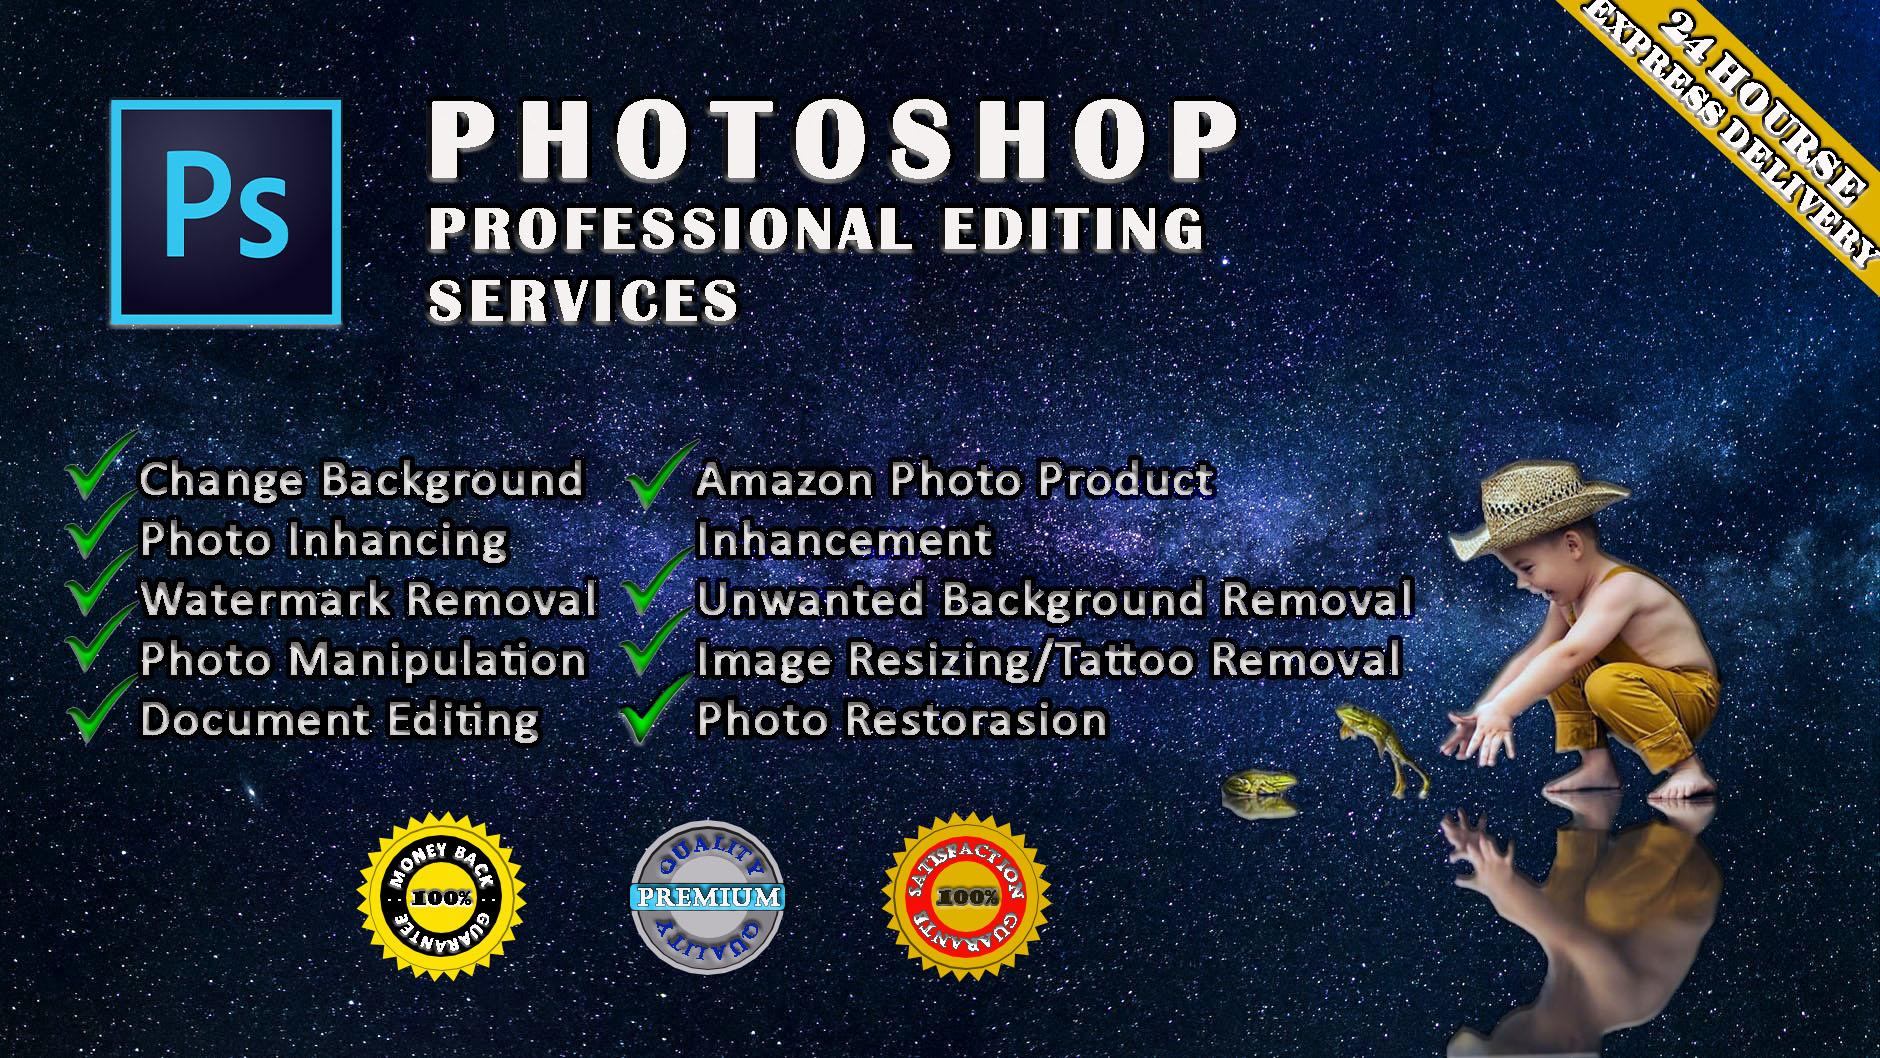 I am Graphic designer do Photoshop editing service professionally